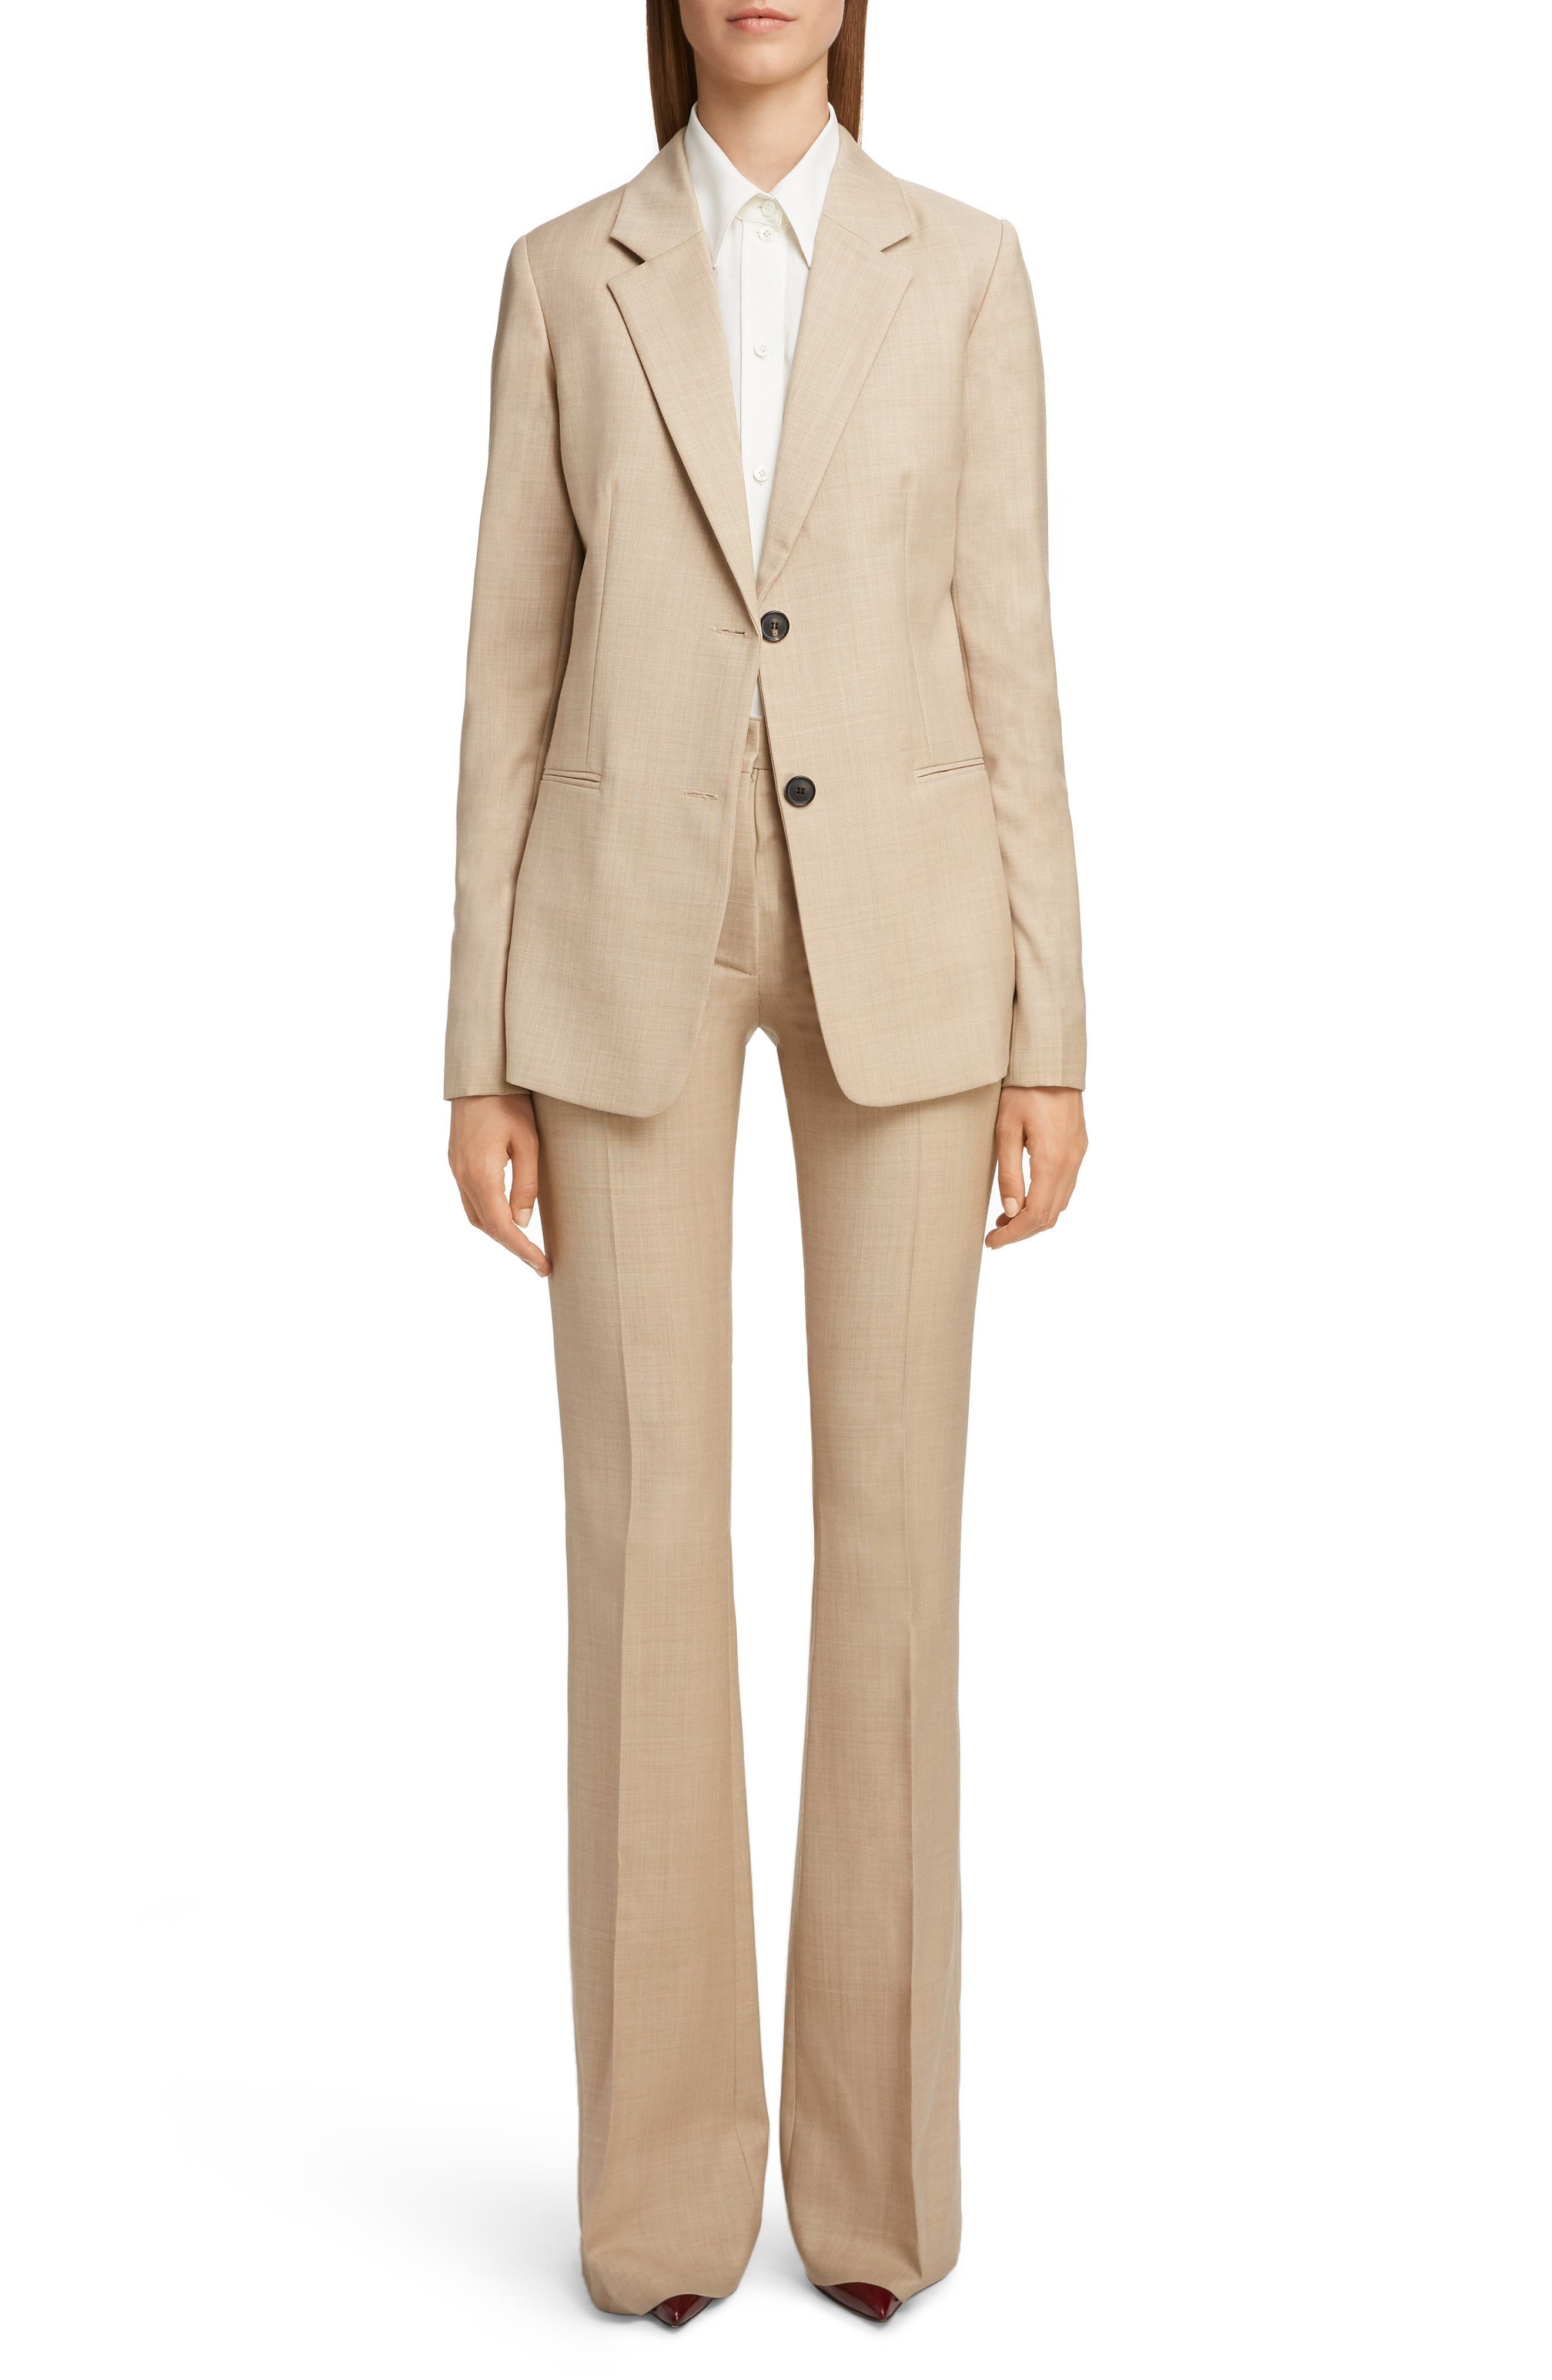 VICTORIA BECKHAM, High Waist Flare Wool Pants, Alternate thumbnail 6, color, LIGHT BEIGE-WHITE